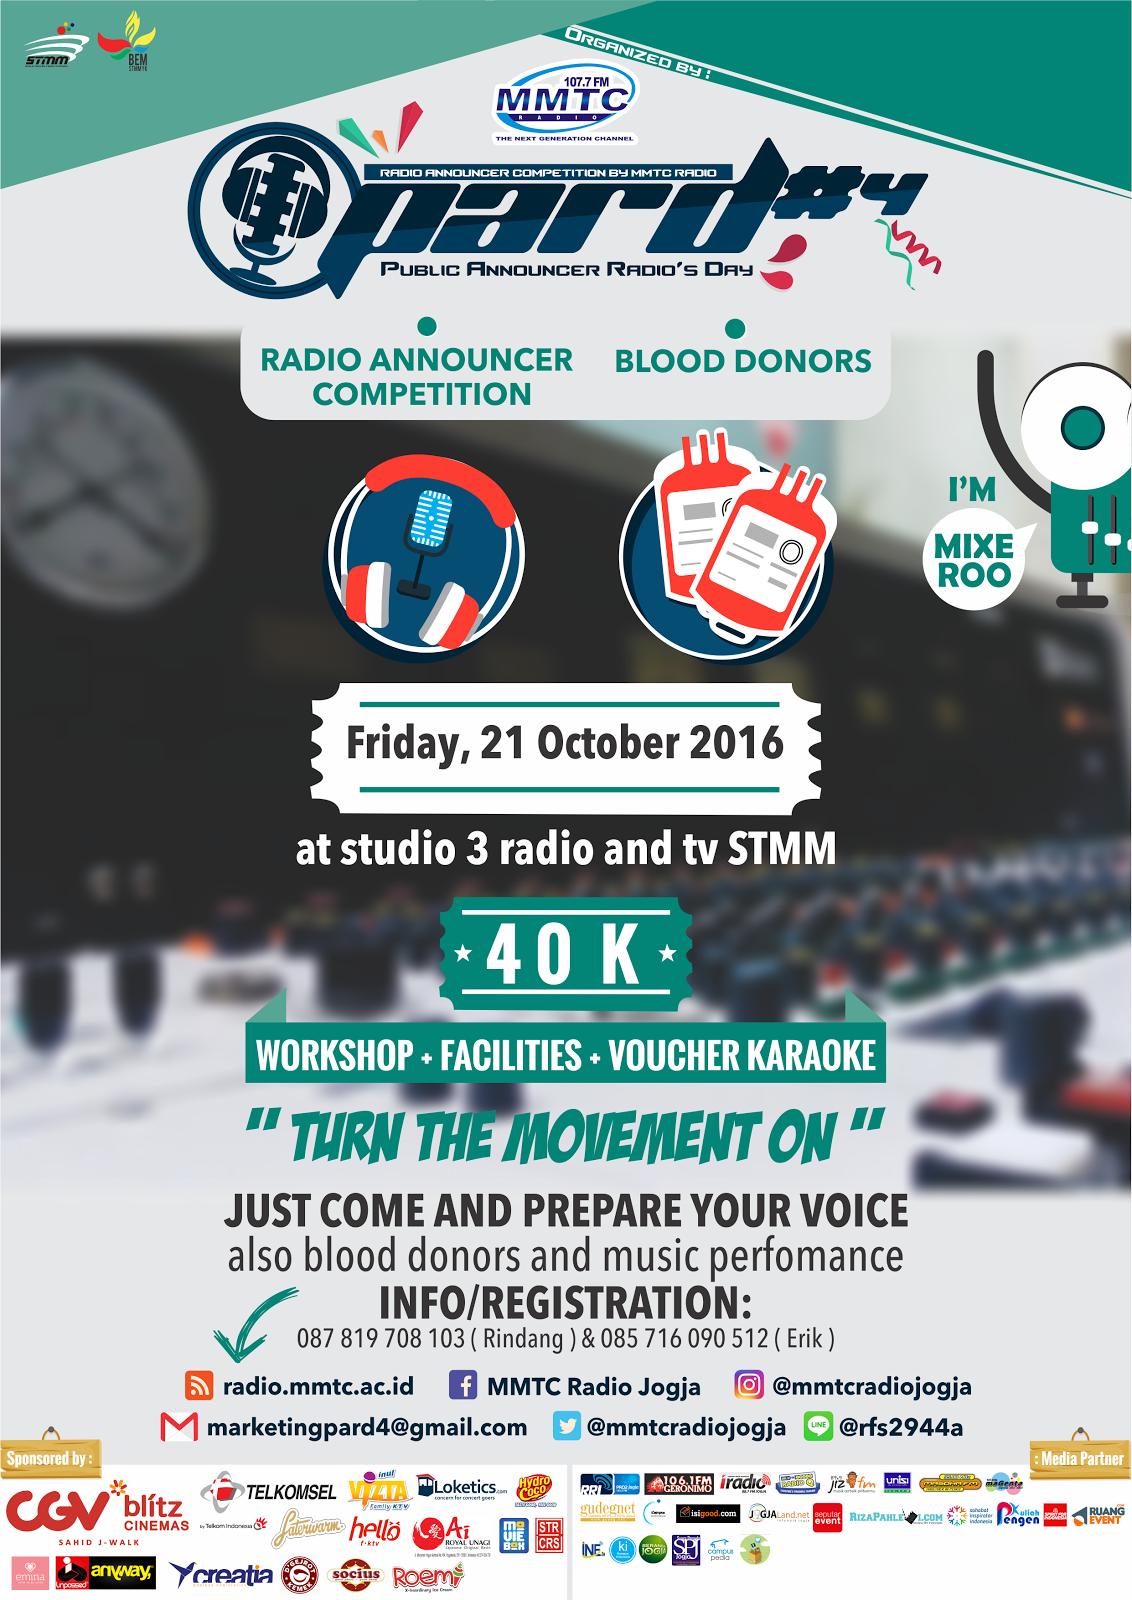 MMTC Radio Event